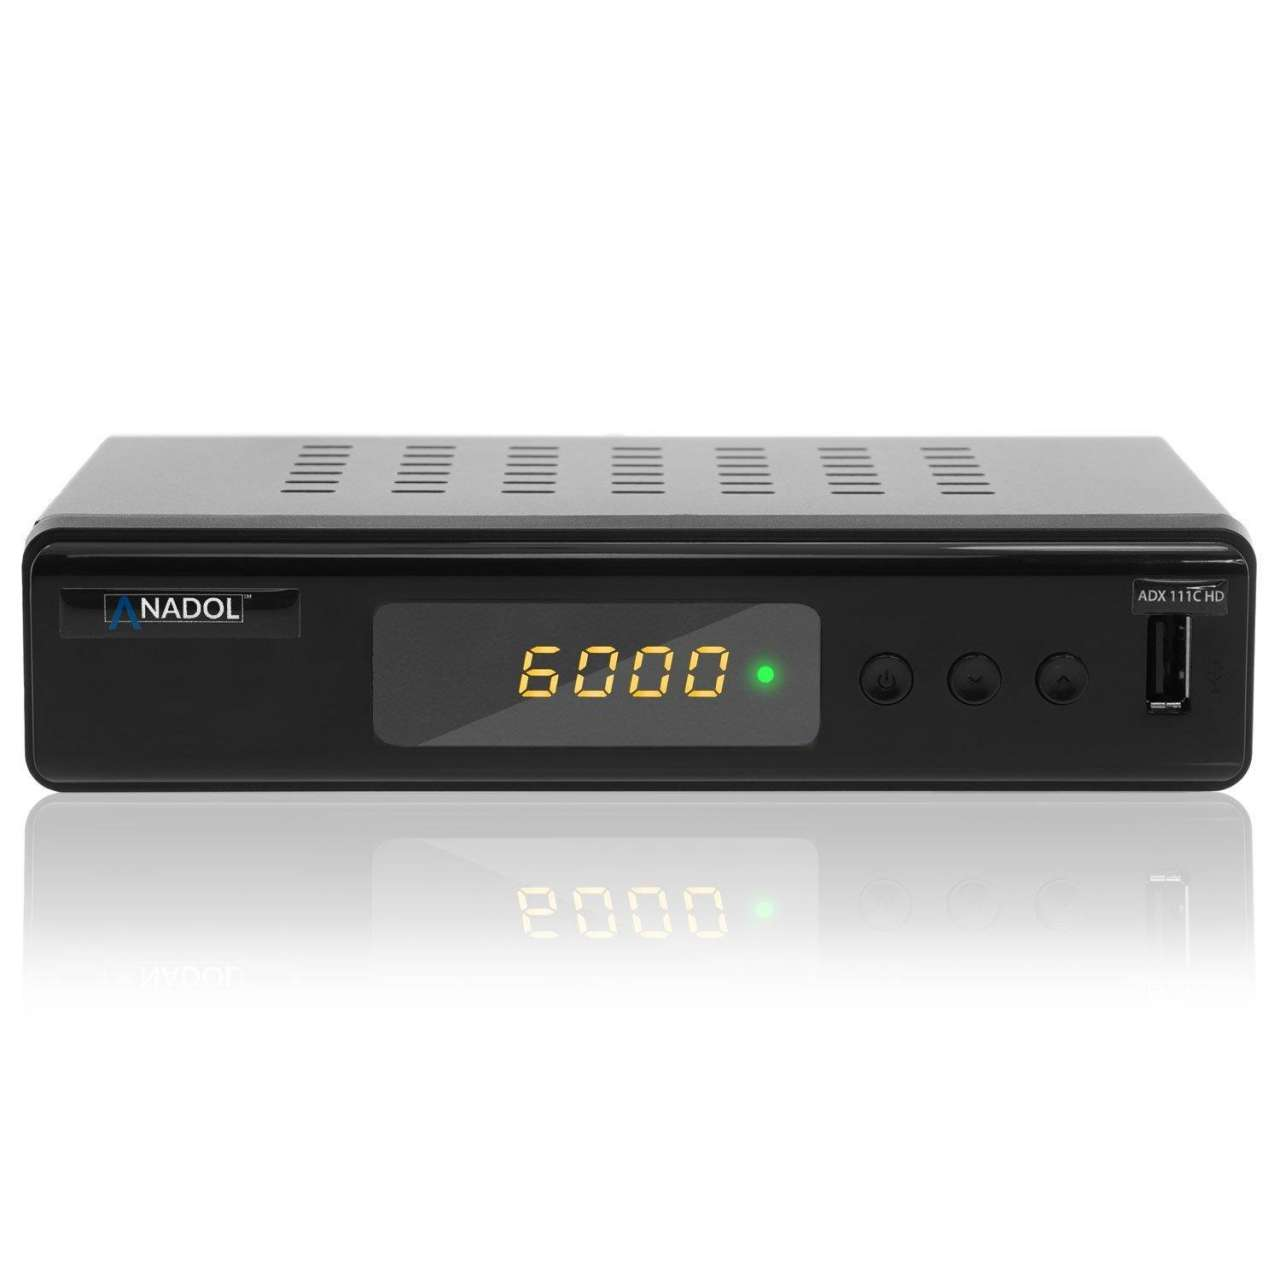 Anadol ADX 111c HD Full HD Kabel FTA Receiver RECANA003